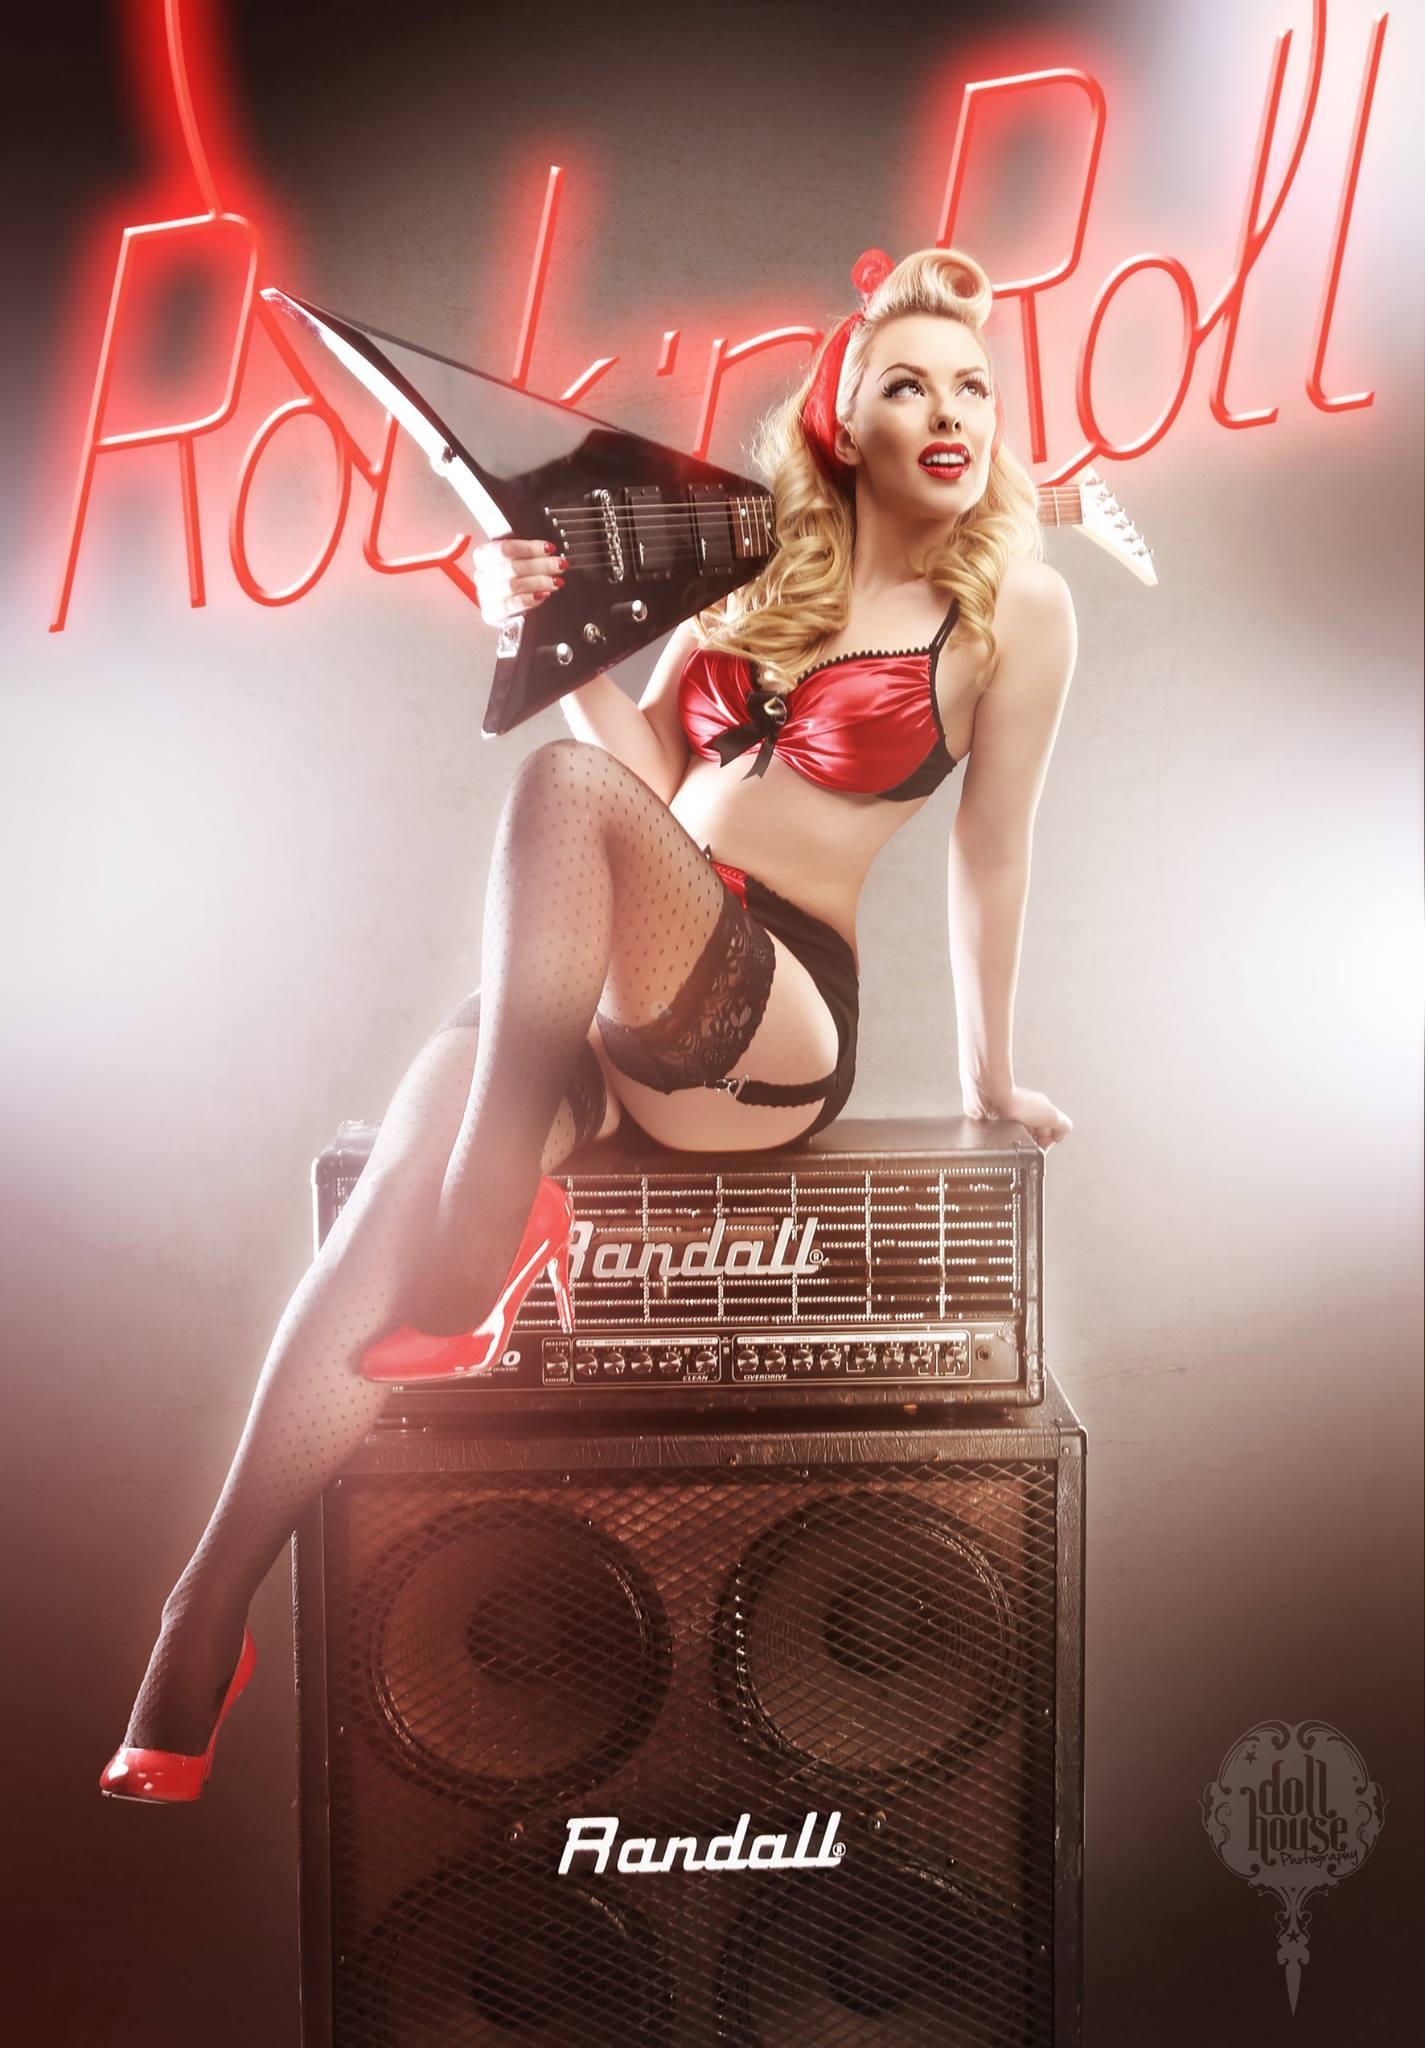 Rock n Roll Guitar Pinup Model